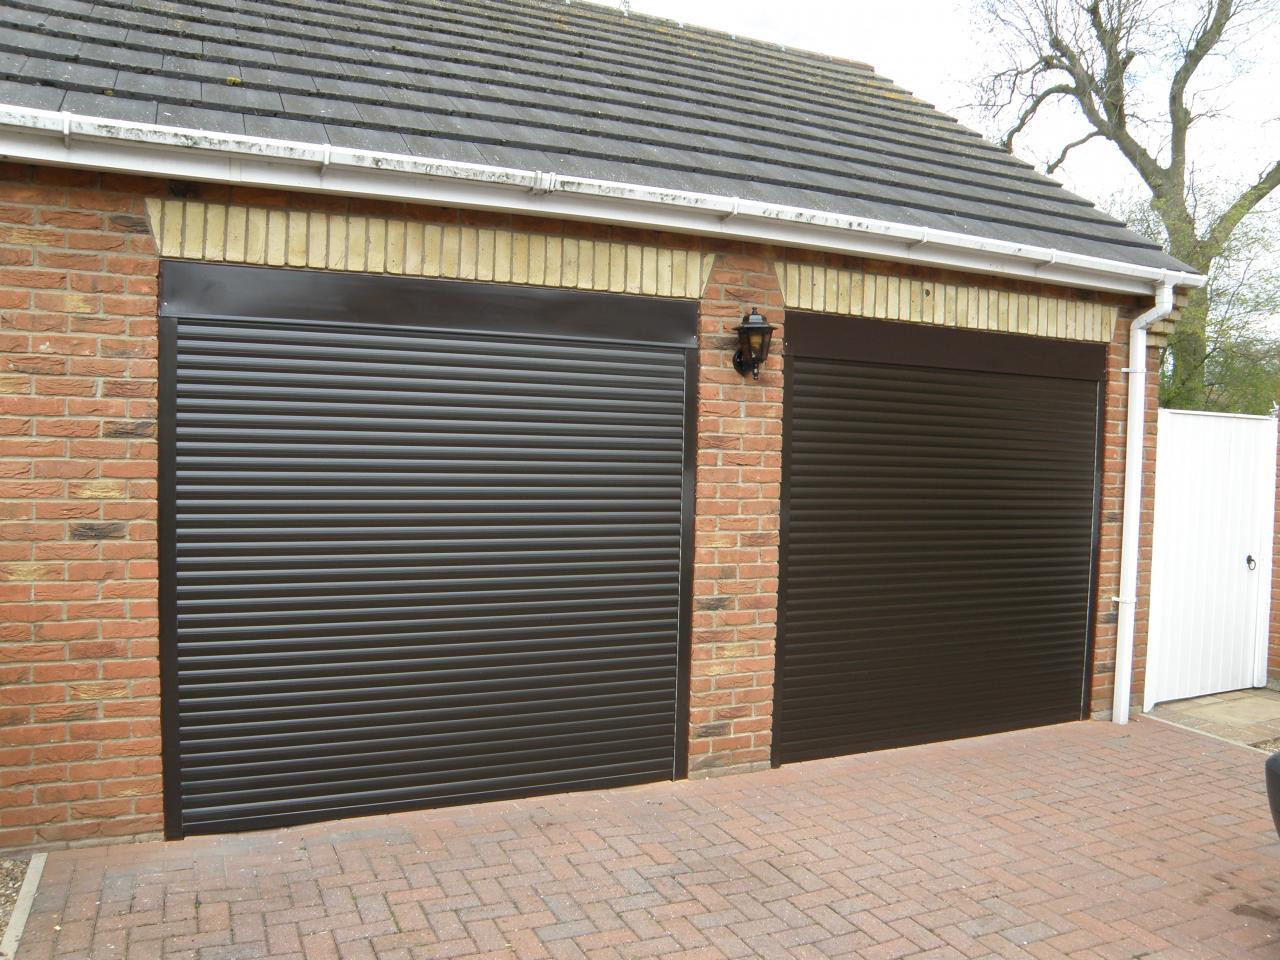 Sizes And Installation Cost Of Roll Up Garage Doors Garage Sanctum